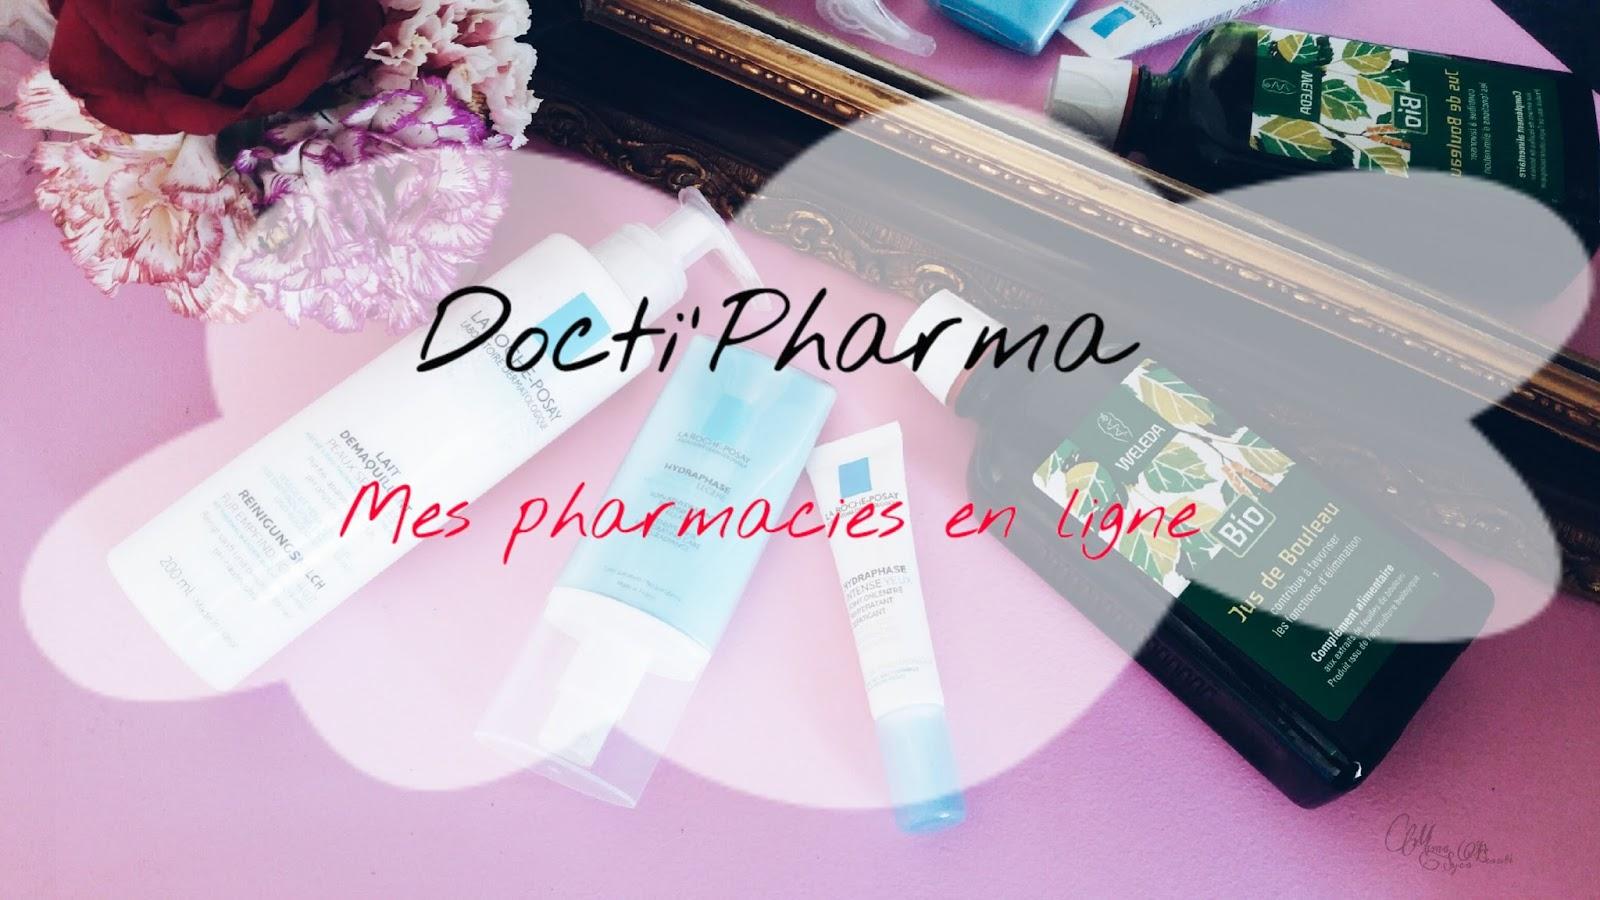 avis-site-doctipharma-code-promo-mama-syca-beaute